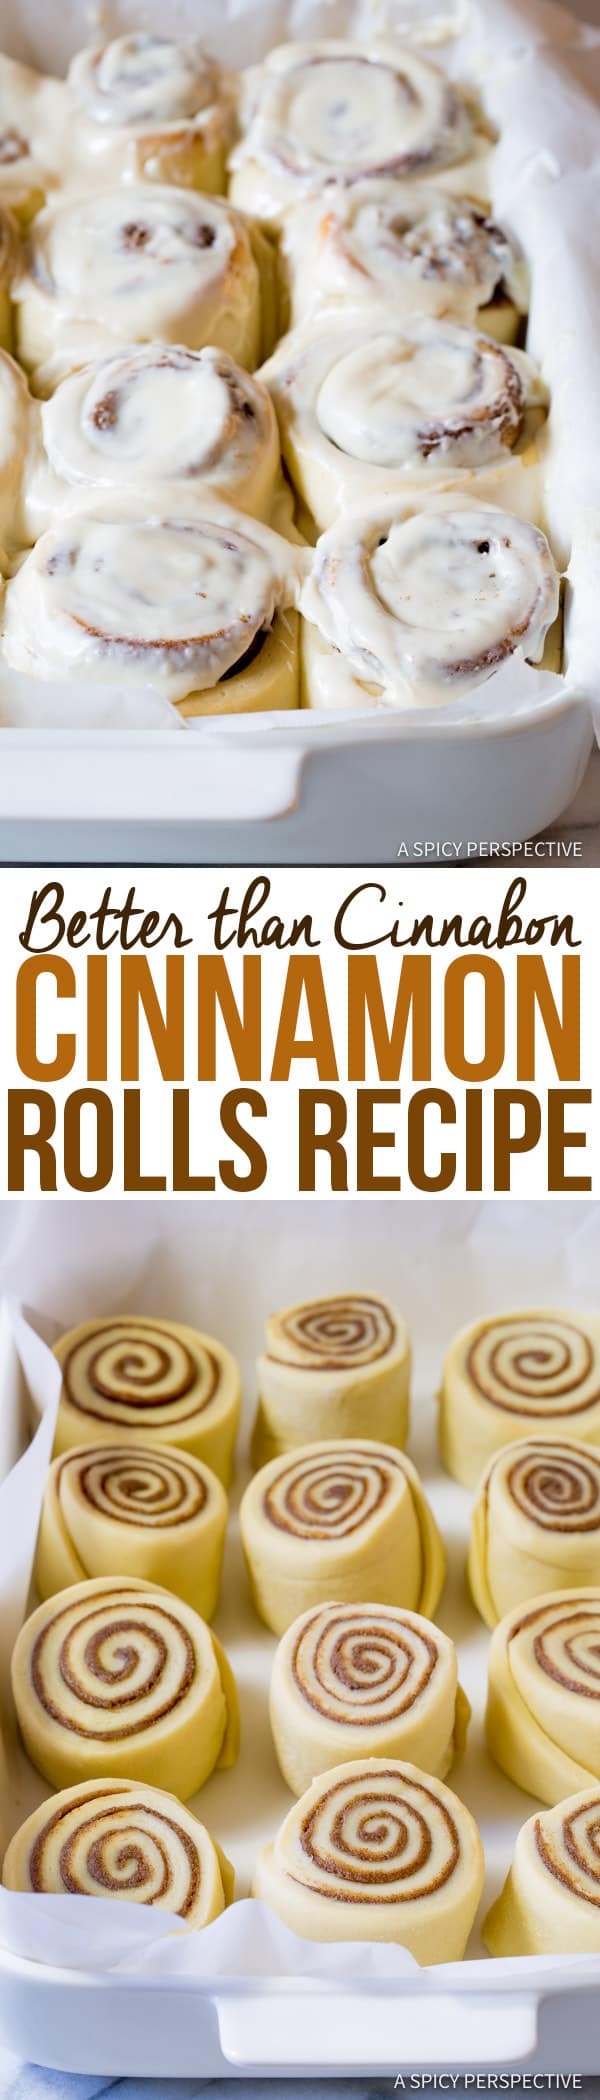 "Decadent ""Better than Cinnabon"" Cinnamon Rolls Recipe | ASpicyPerspective.com"